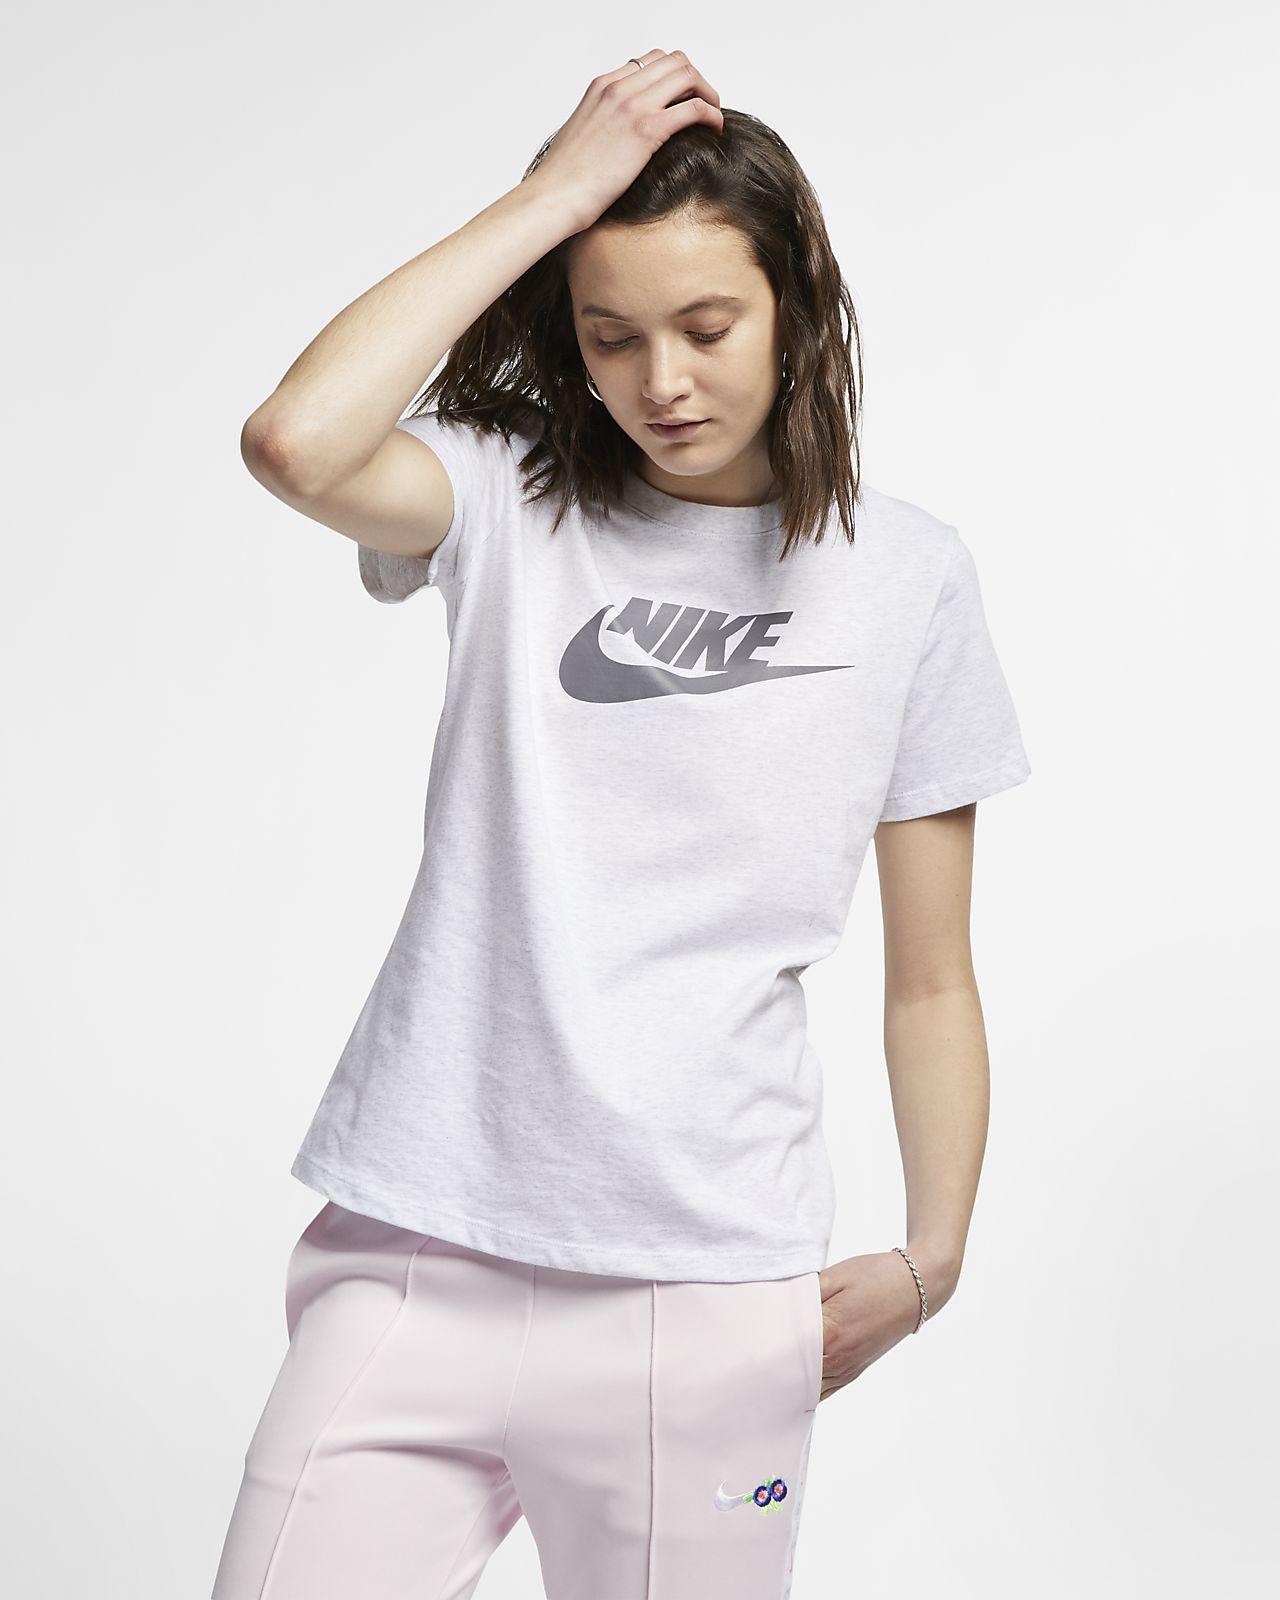 640c2b880 Nike Sportswear Essential Women's T-Shirt. Nike.com